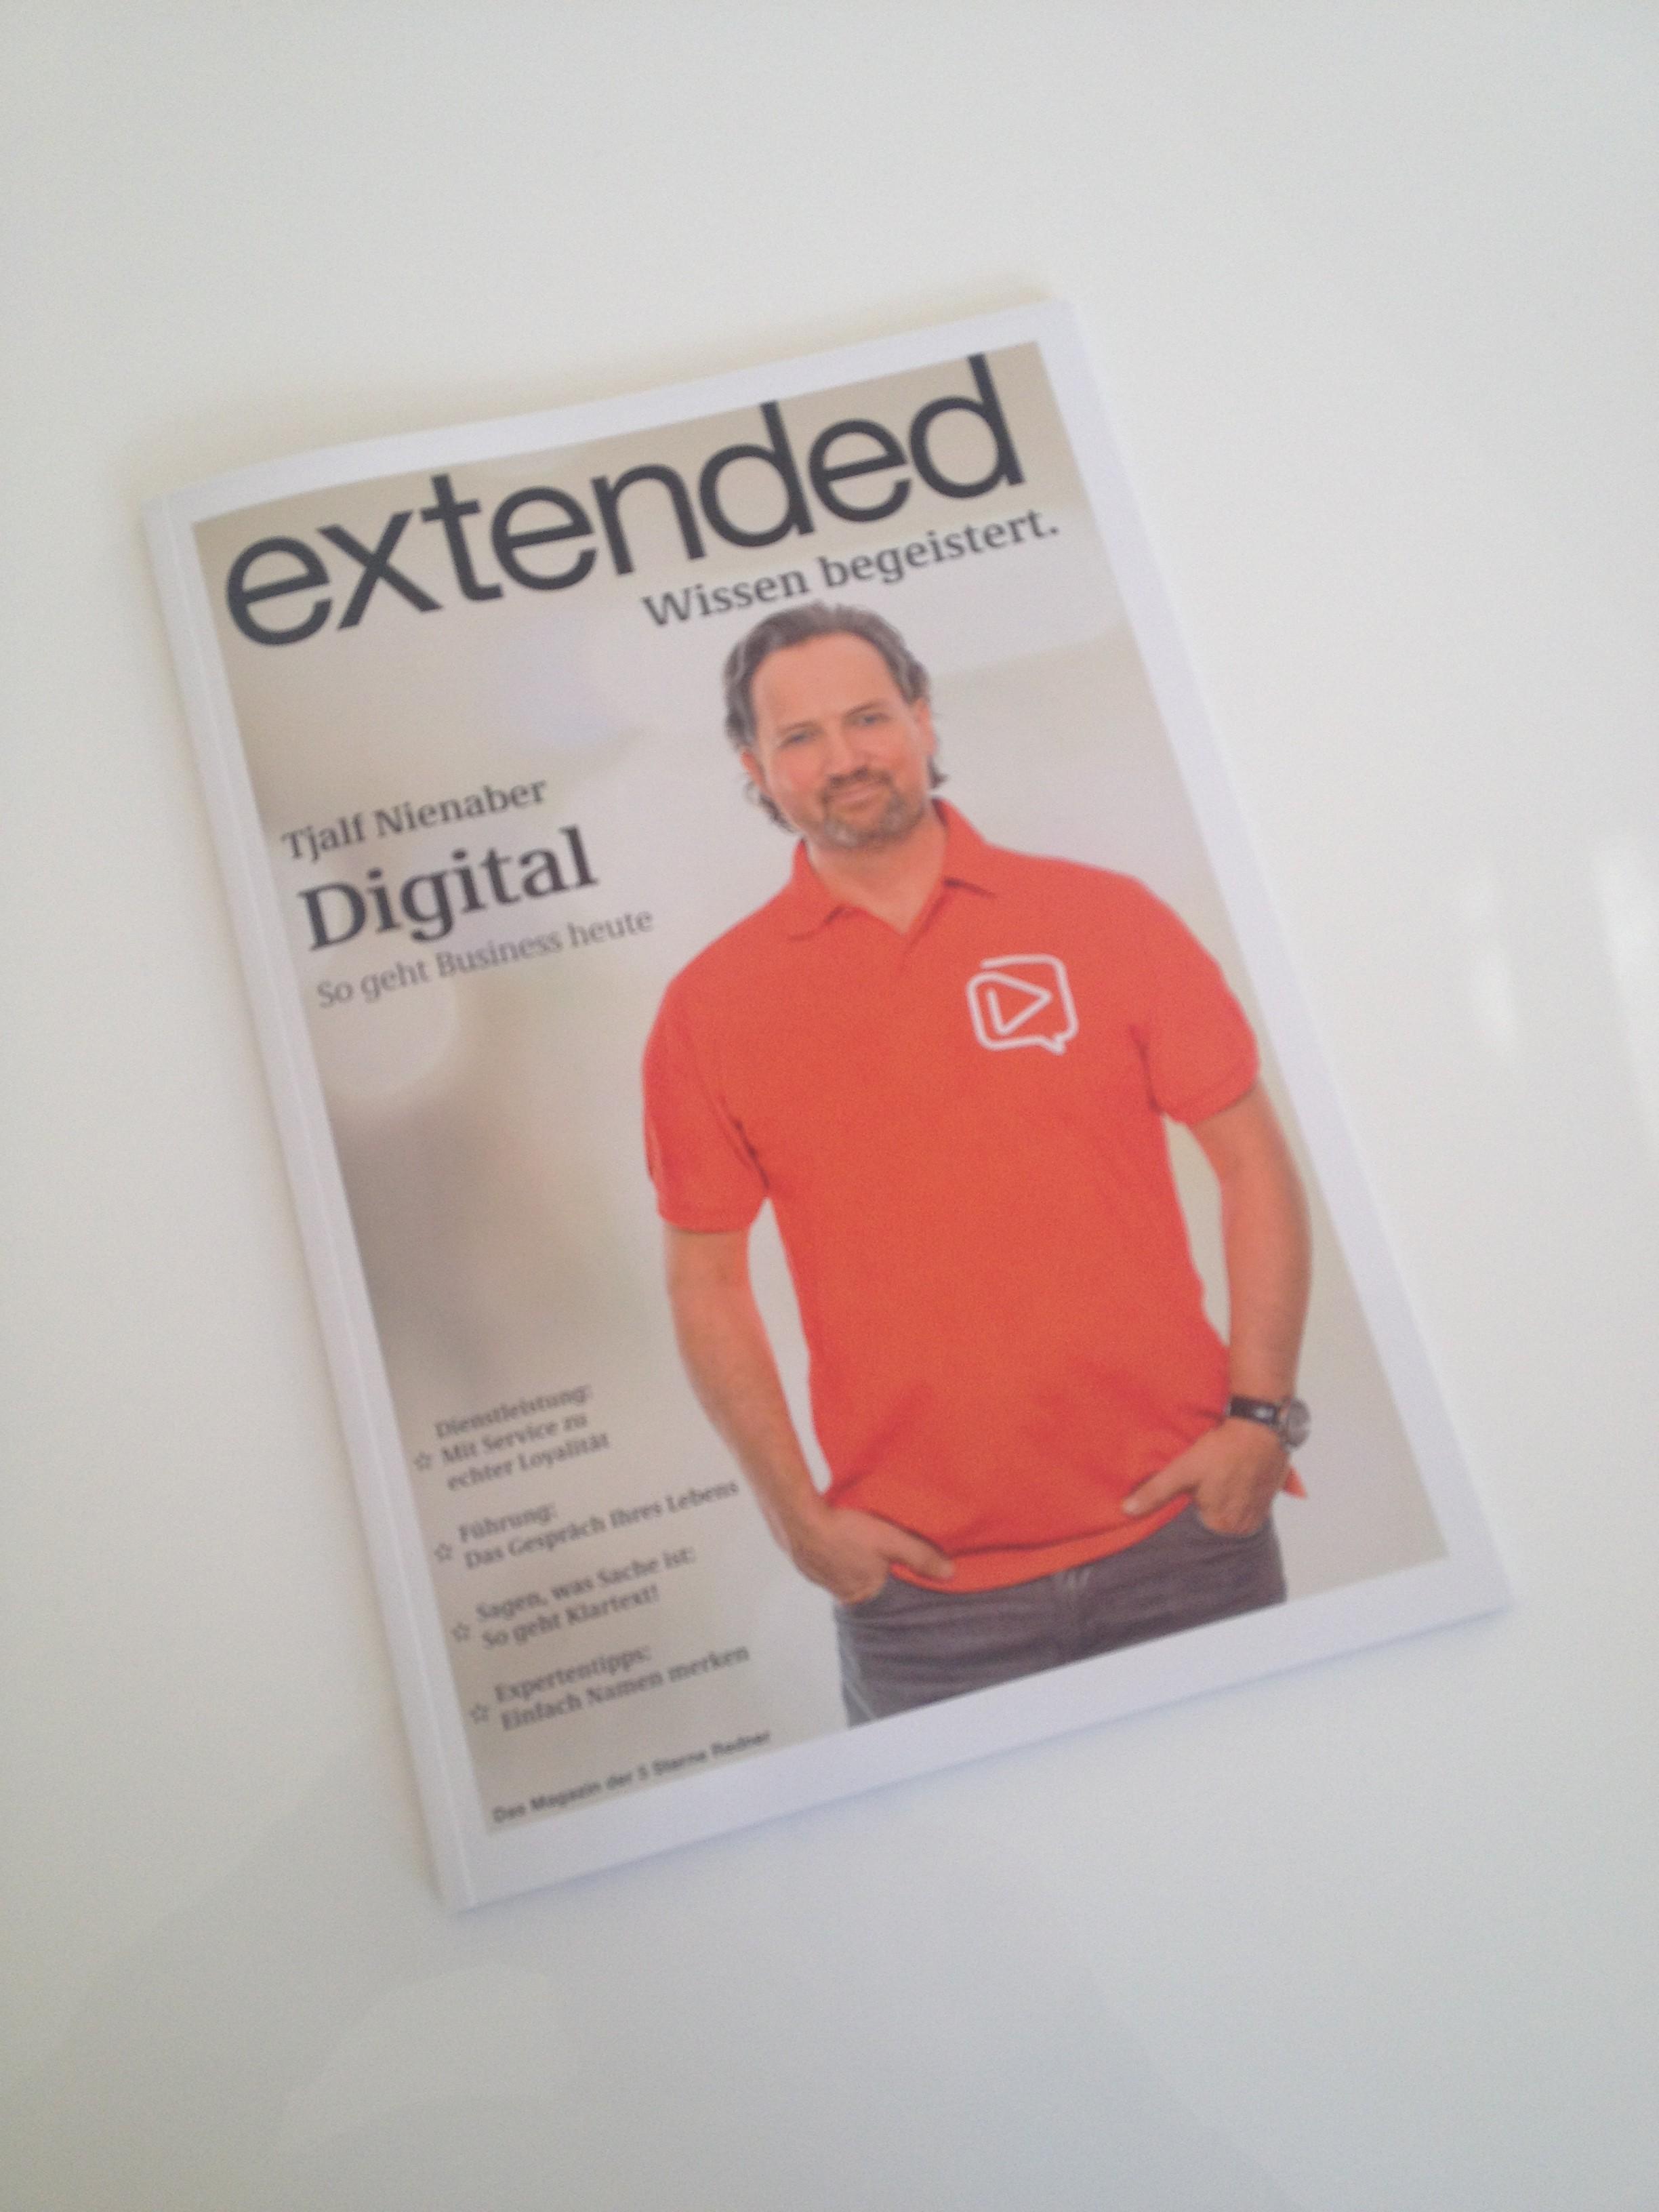 EXTENDED – Wissen begeistert